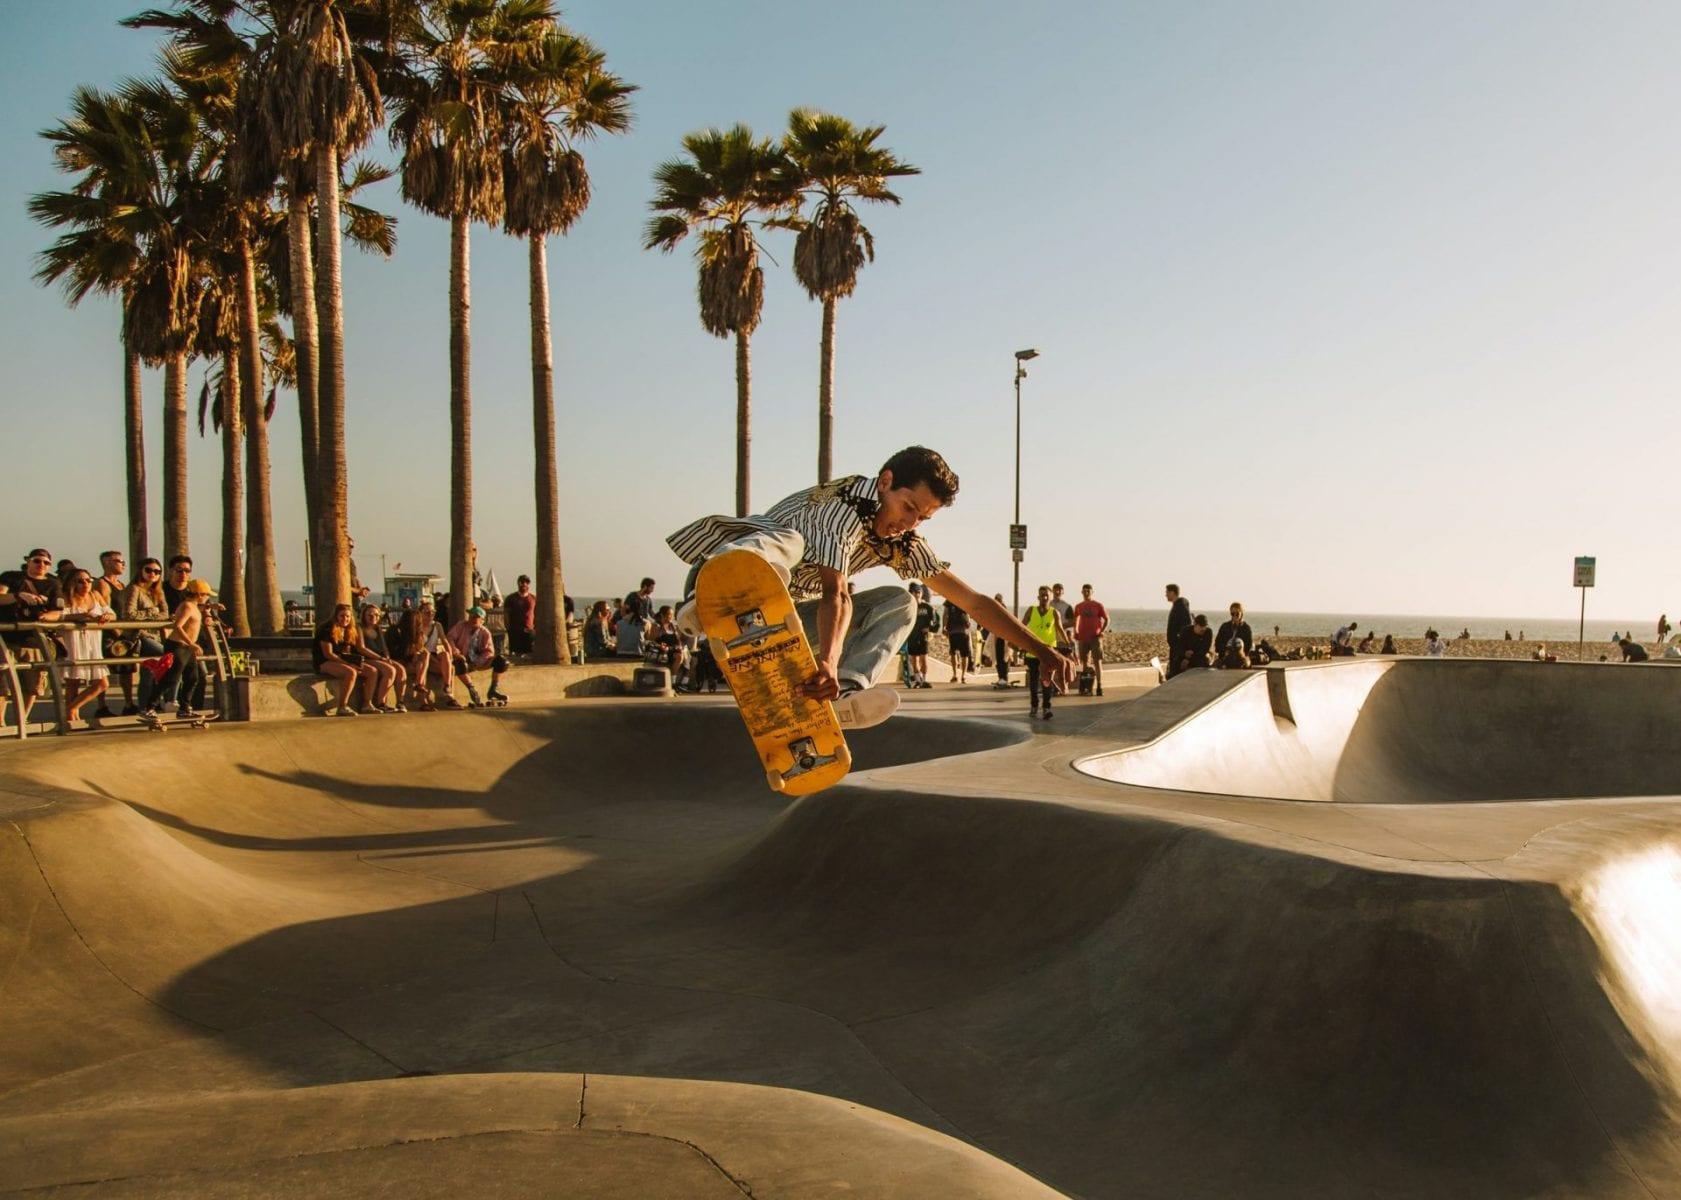 Skateboarding on Venice Beach